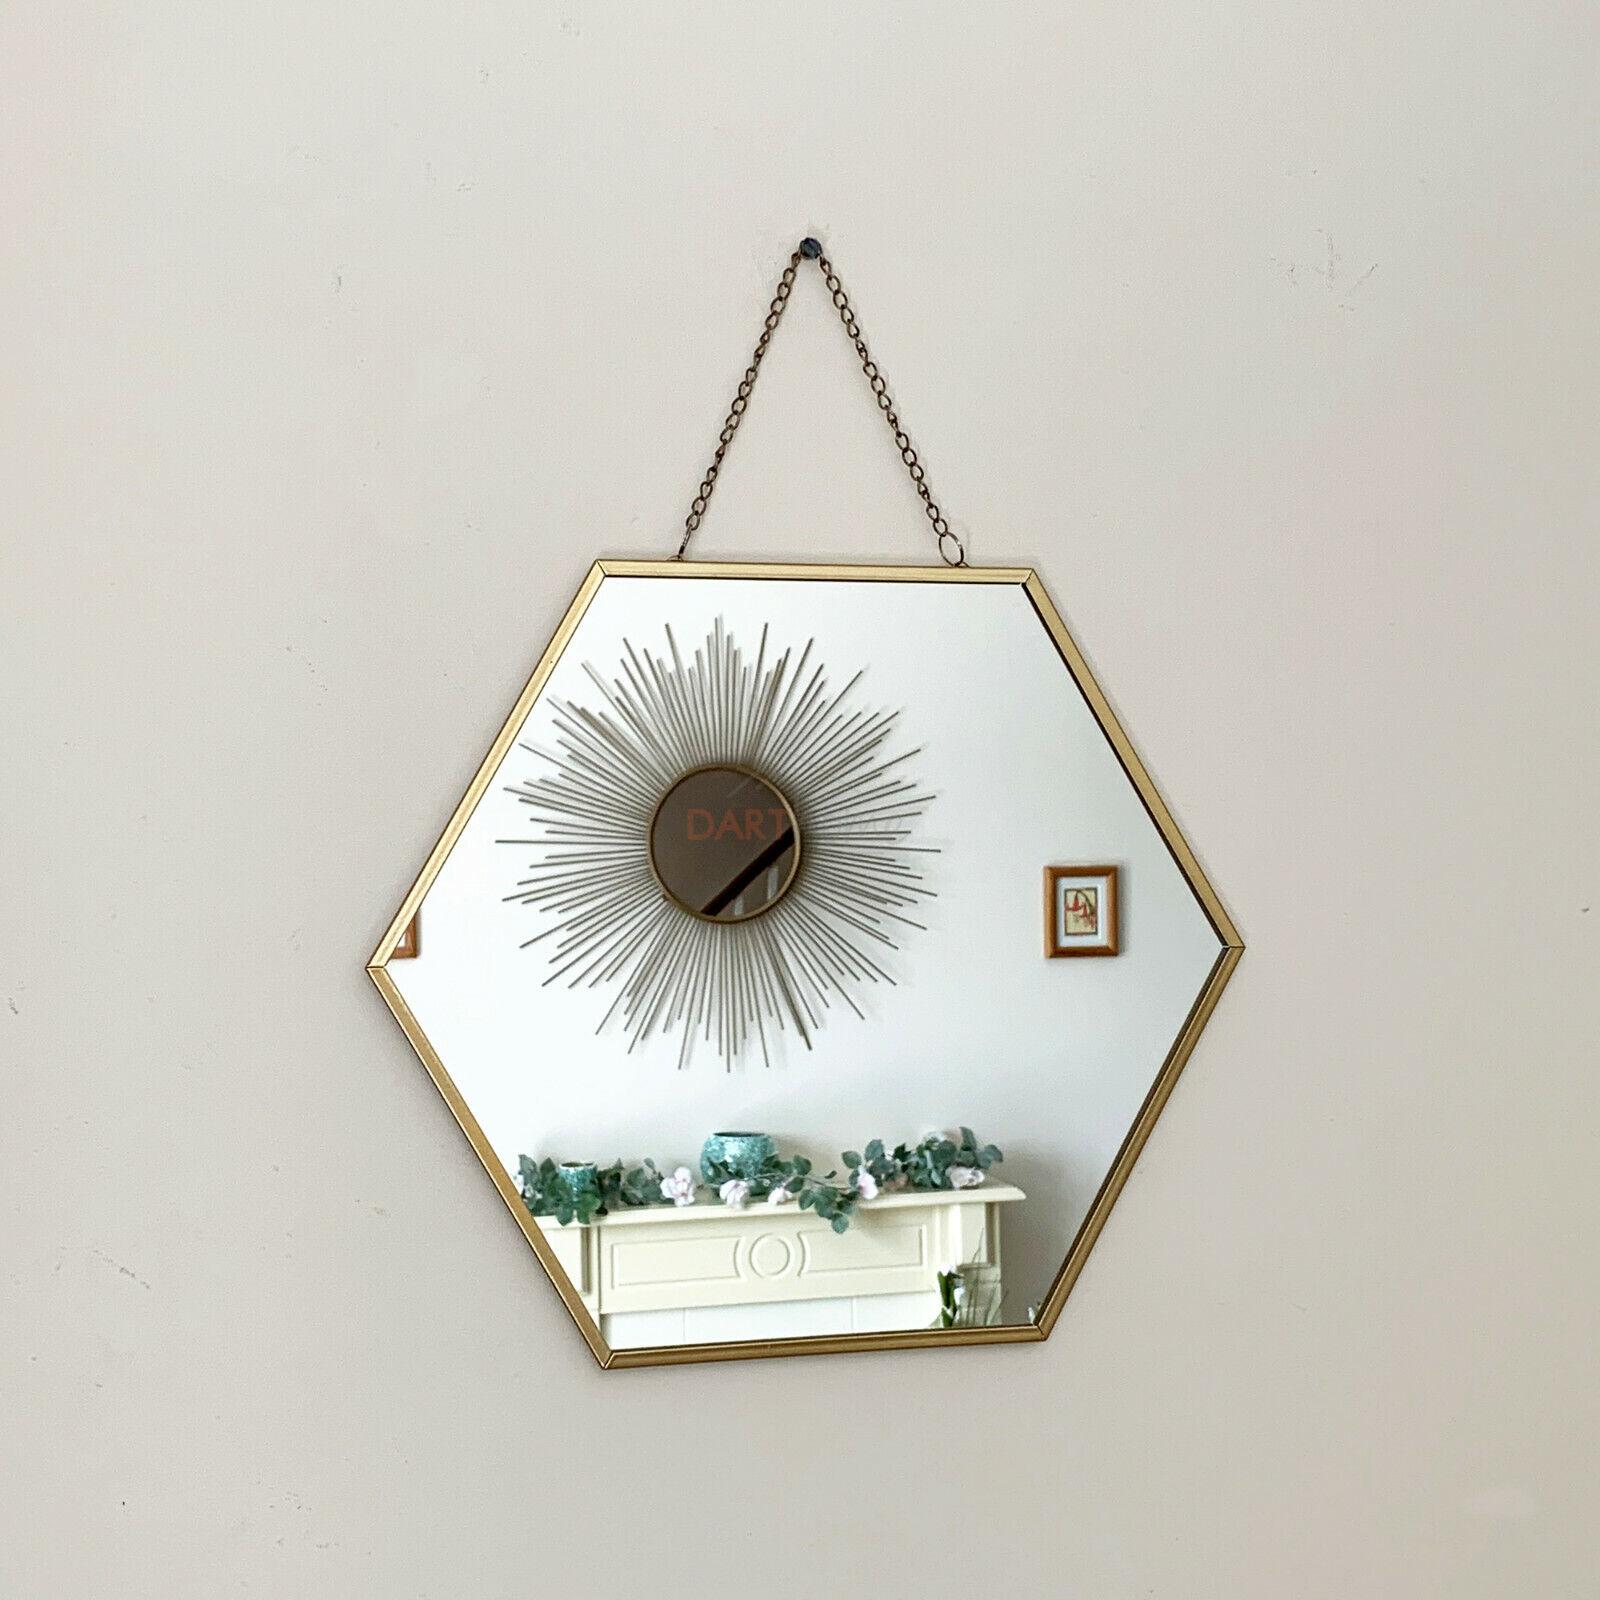 mirror - Vintage Hexagonal Chain Hanging Gold Bathroom Shaving Glass Wall Decor Mirror